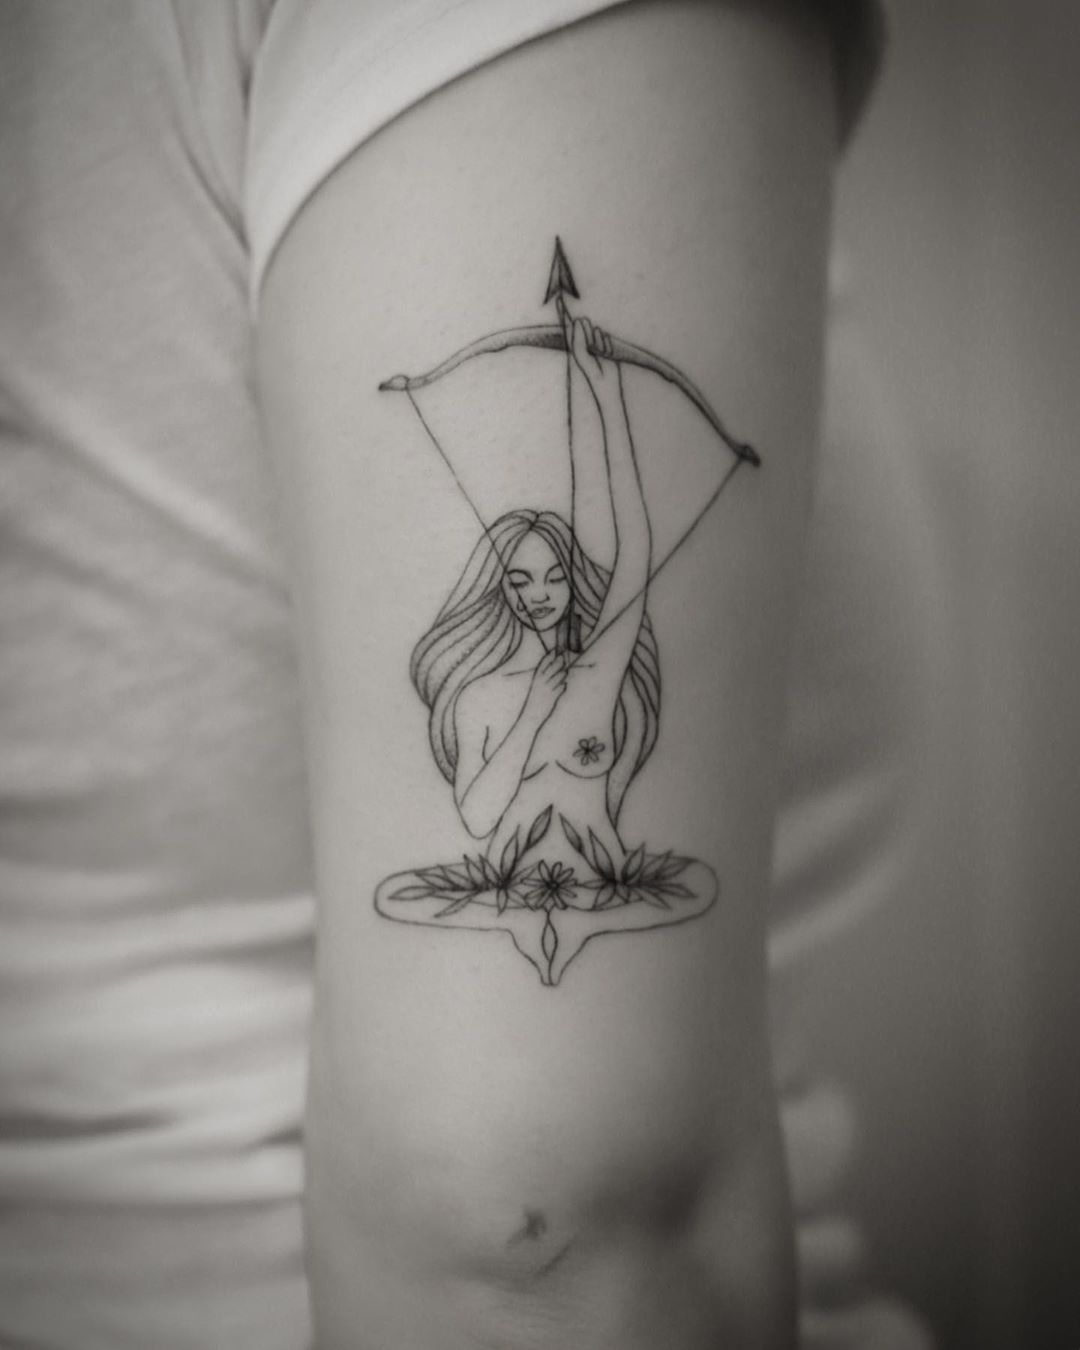 Inksearch tattoo Anna Indianka